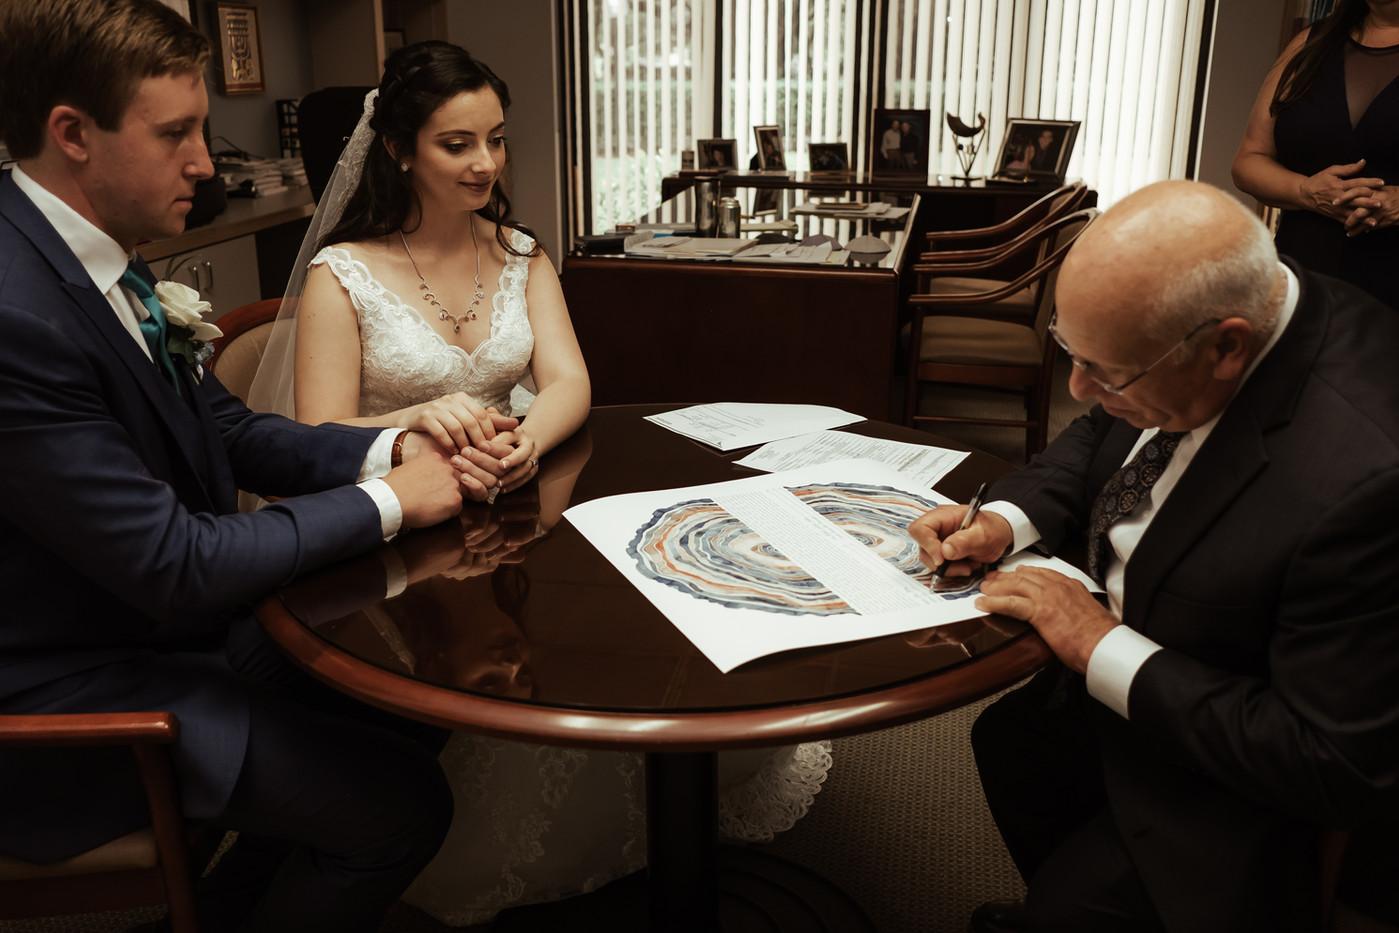 dunedin-jewish-wedding-rachael-247.jpg